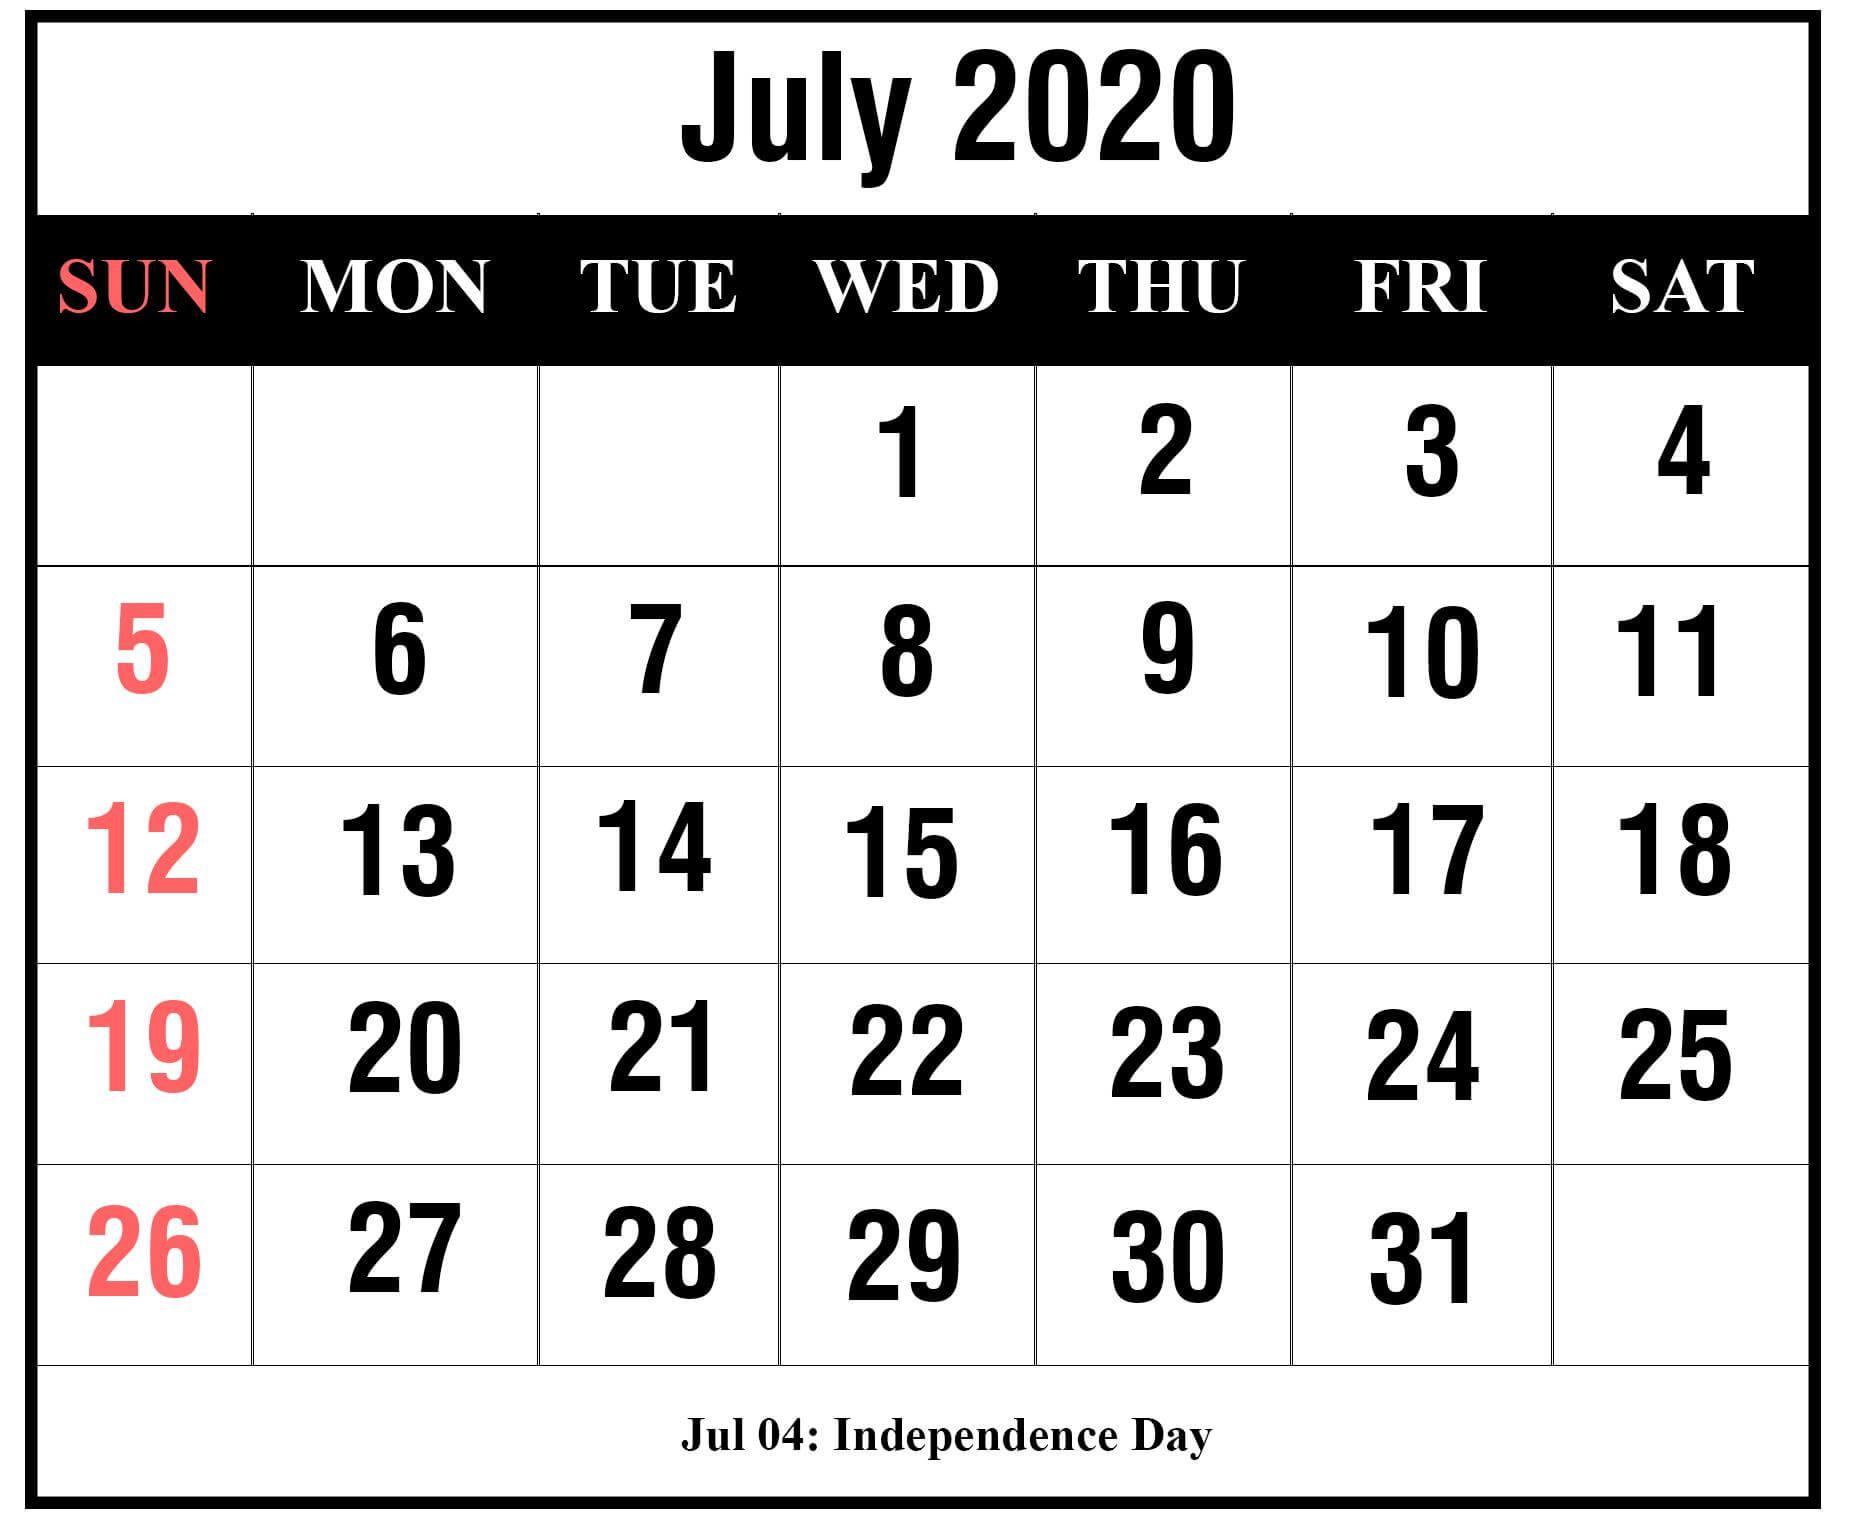 July 2020 Calendar Template For Kids